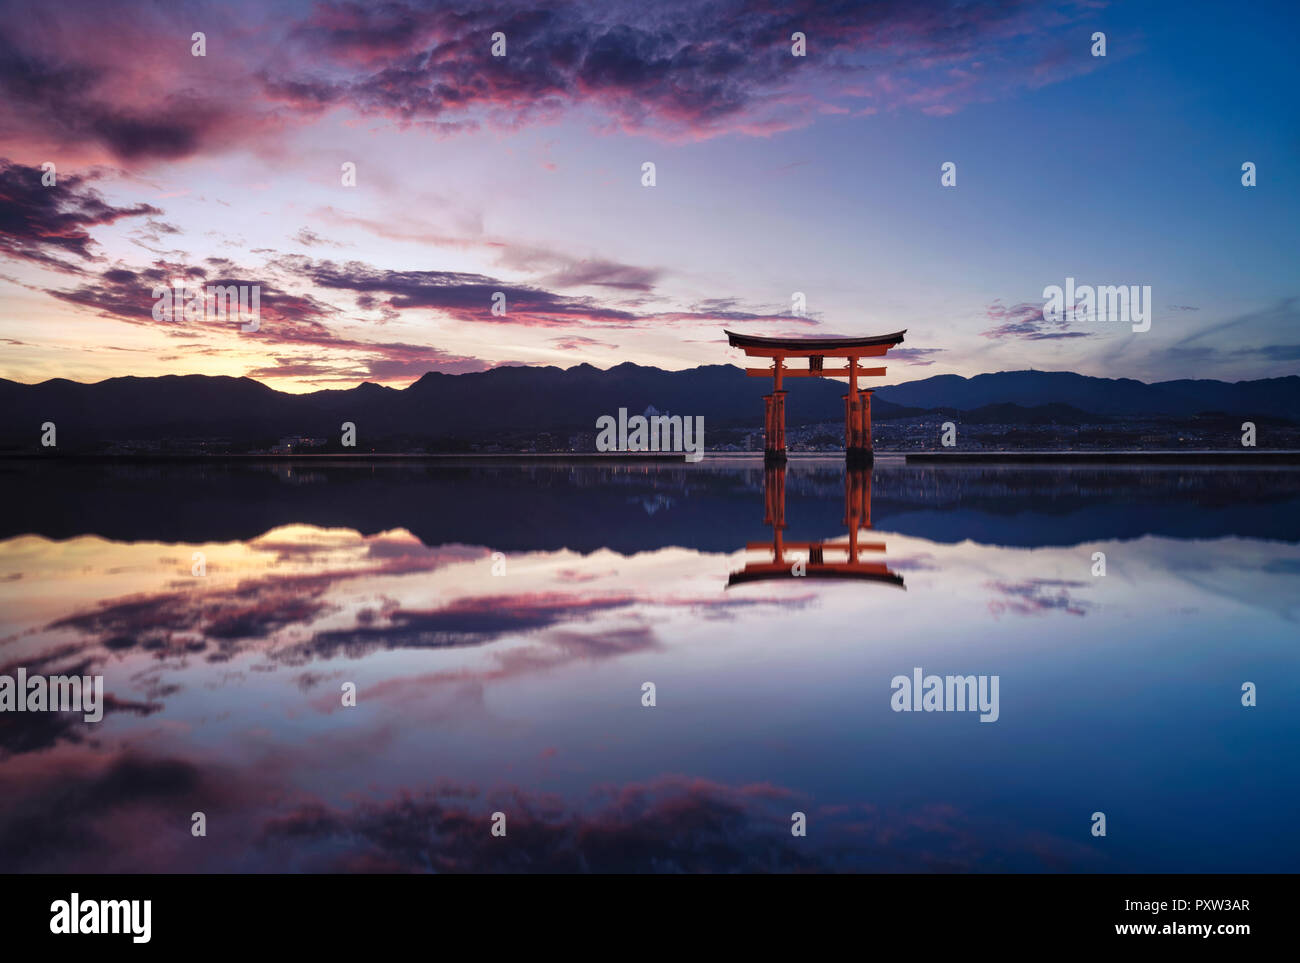 Japan, Hiroshima, Miyajima, Itsukushima Shrine at Seto Inland Sea at sunset - Stock Image